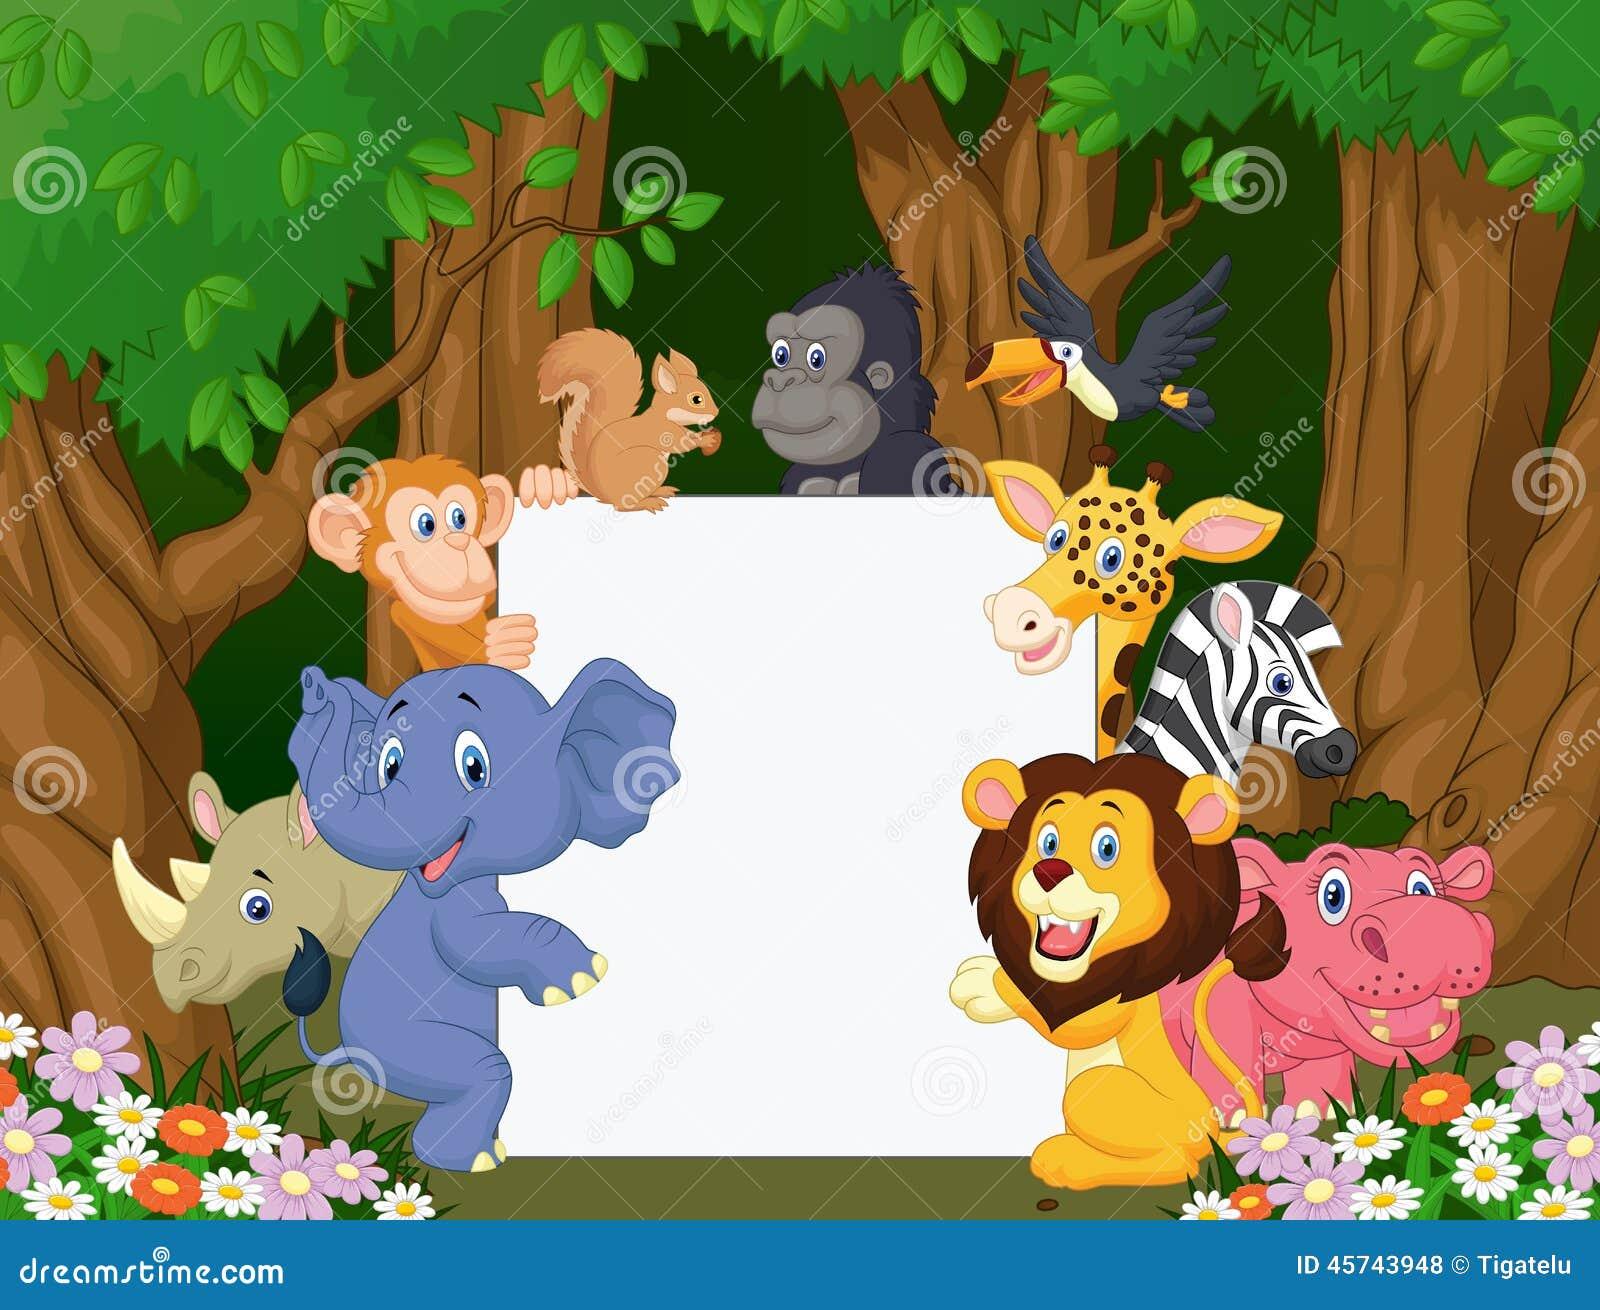 Cartoon Wild Animal Holding Blank Sign Stock Vector